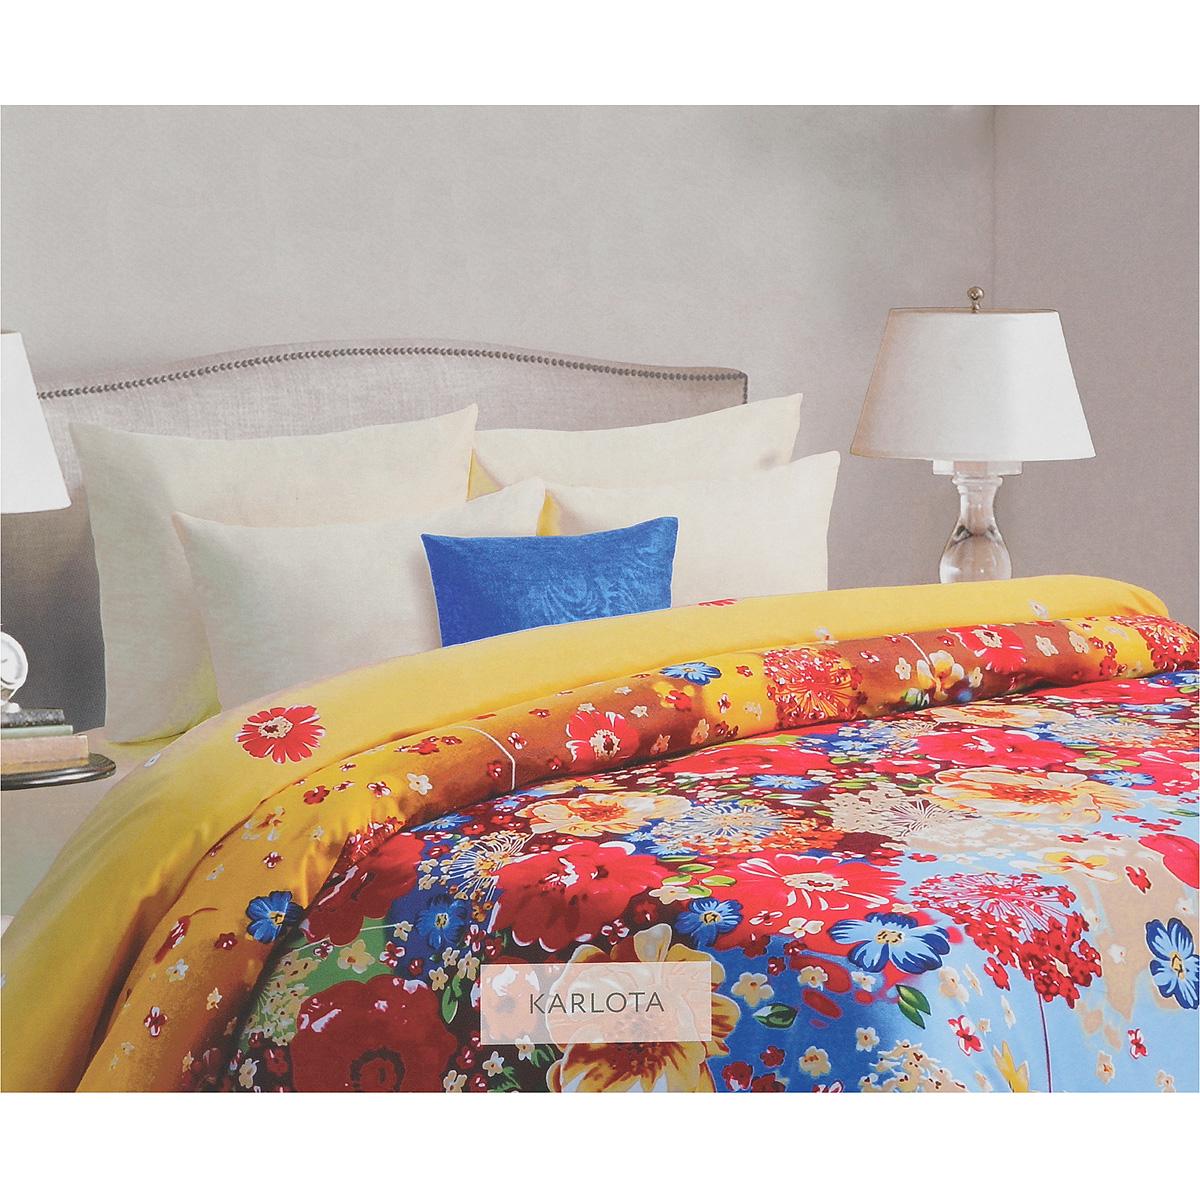 Комплект белья Mona Liza Karlota, евро, наволочки 70х70, цвет: желтый, голубой. 562109/5